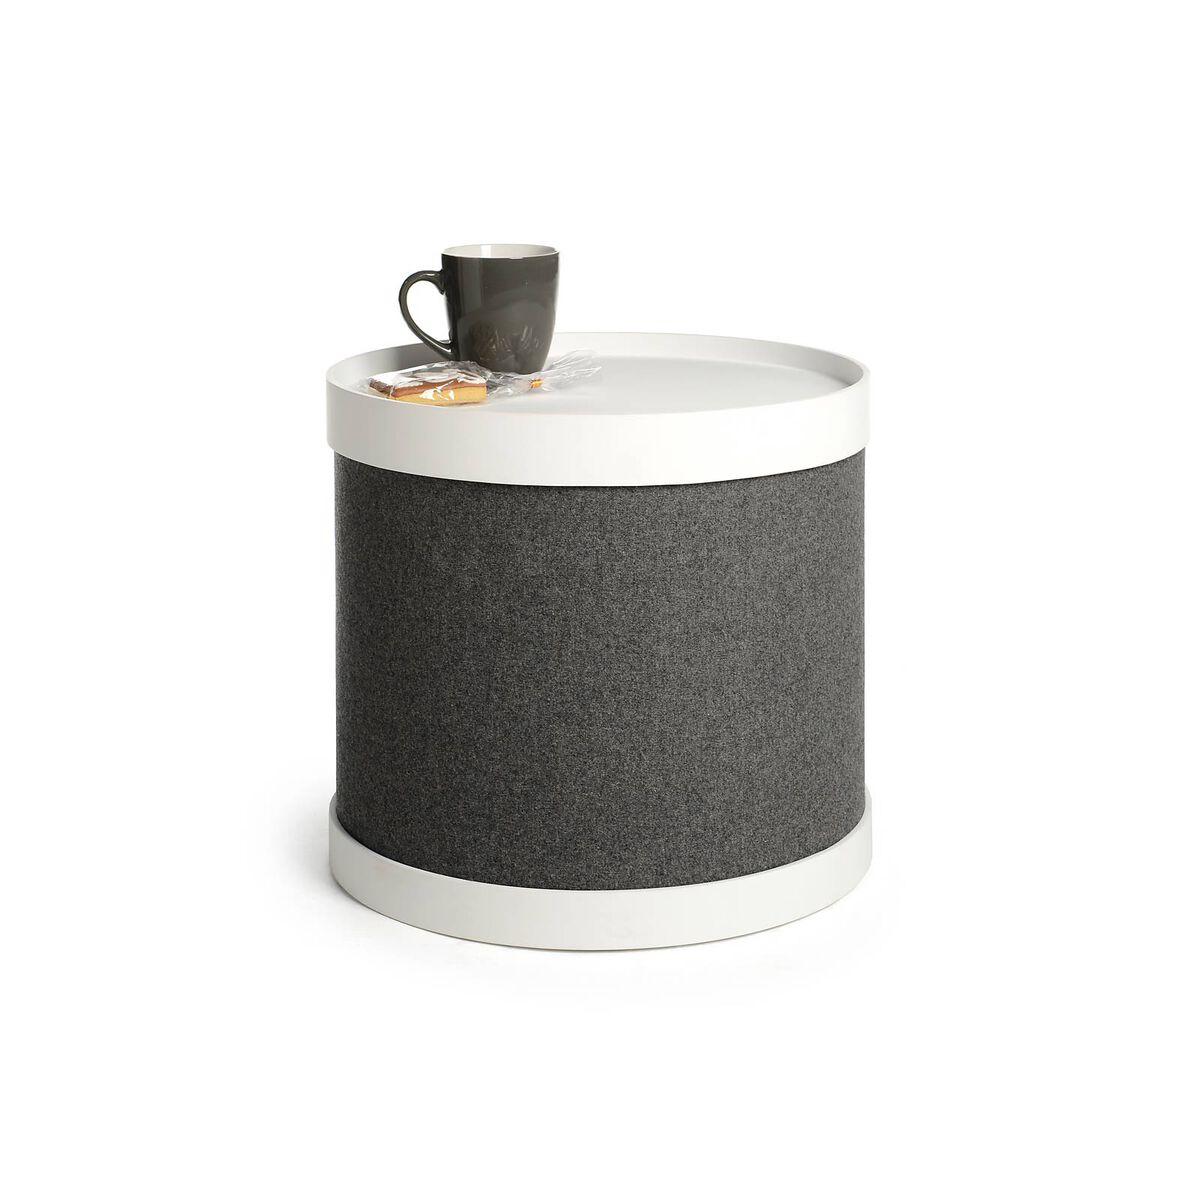 beistelltisch mit abnehmbarem tablett ca d 42 x h 37cm. Black Bedroom Furniture Sets. Home Design Ideas